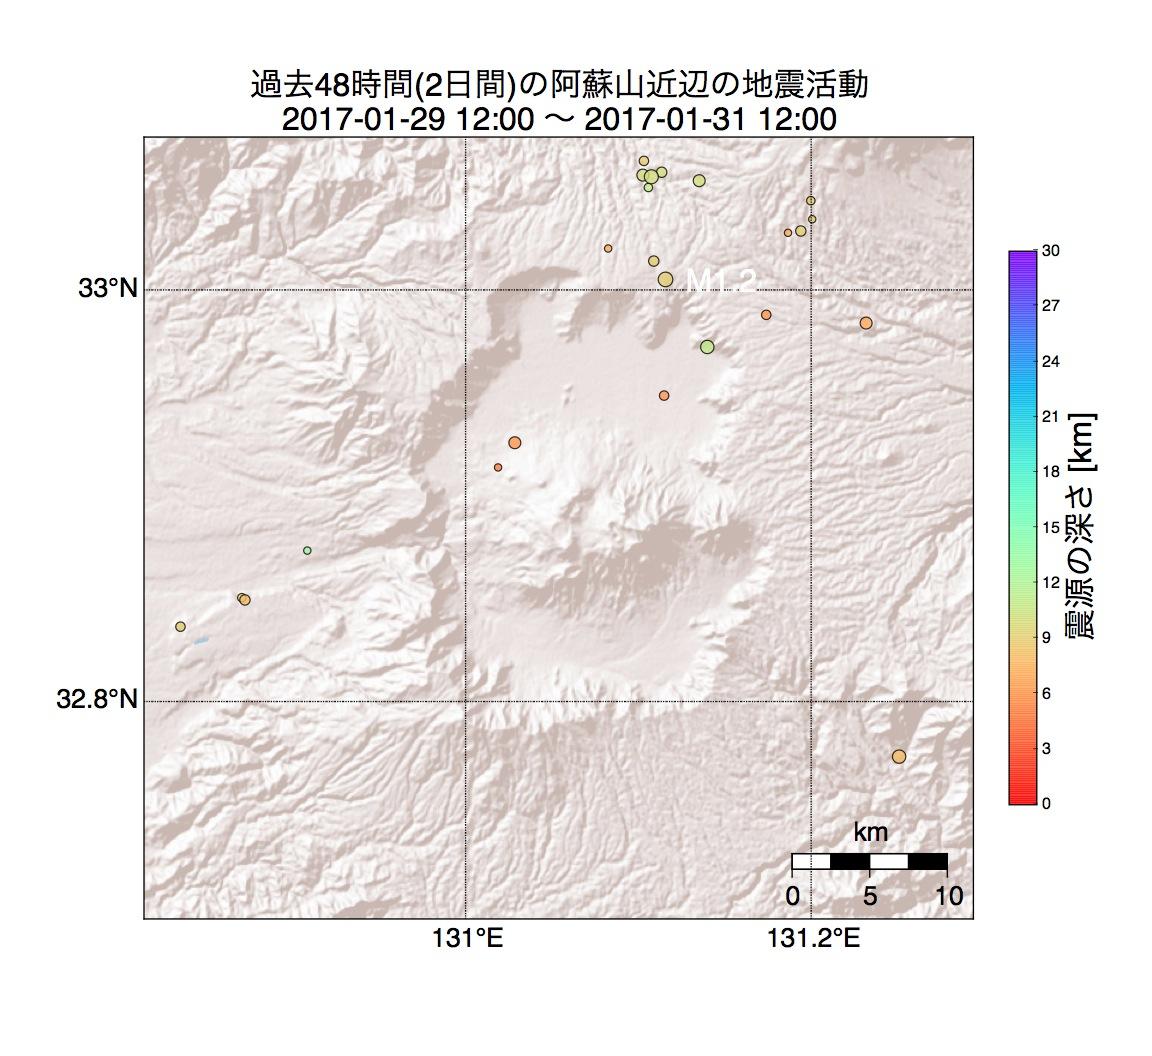 http://jishin.chamu.org/aso/20170131_1.jpg